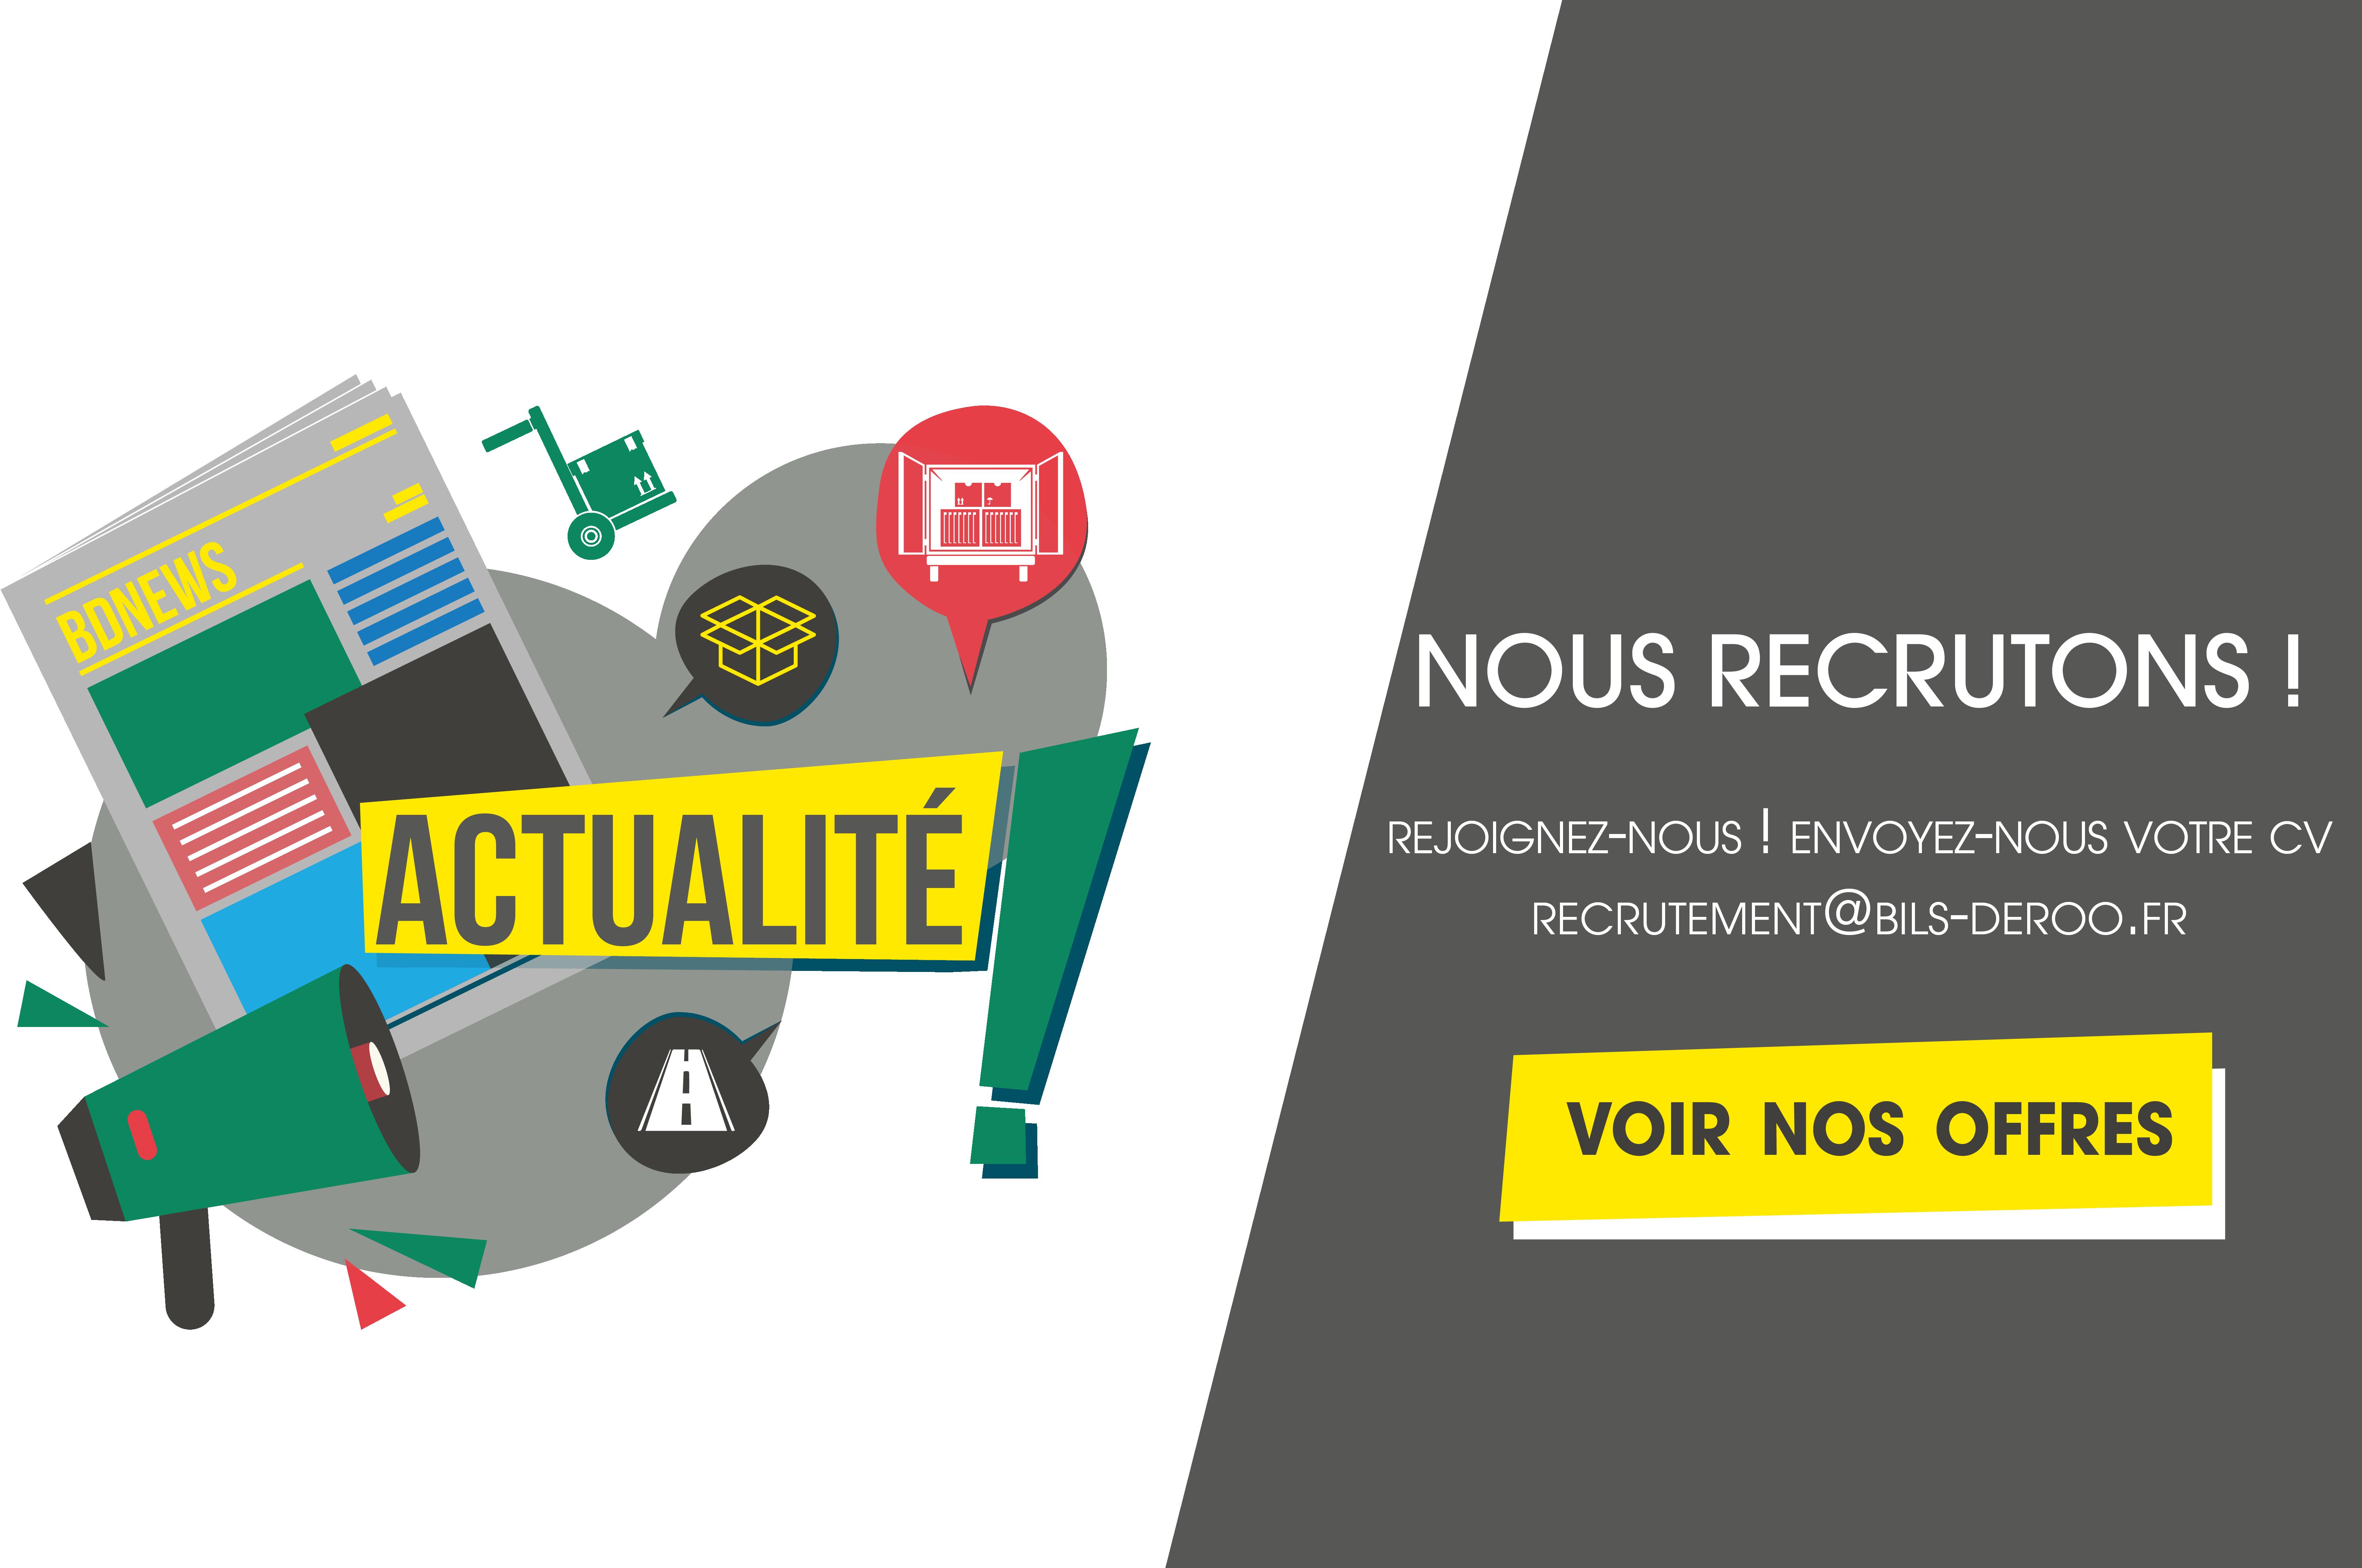 Groupe-bils-deroo.com - Slide